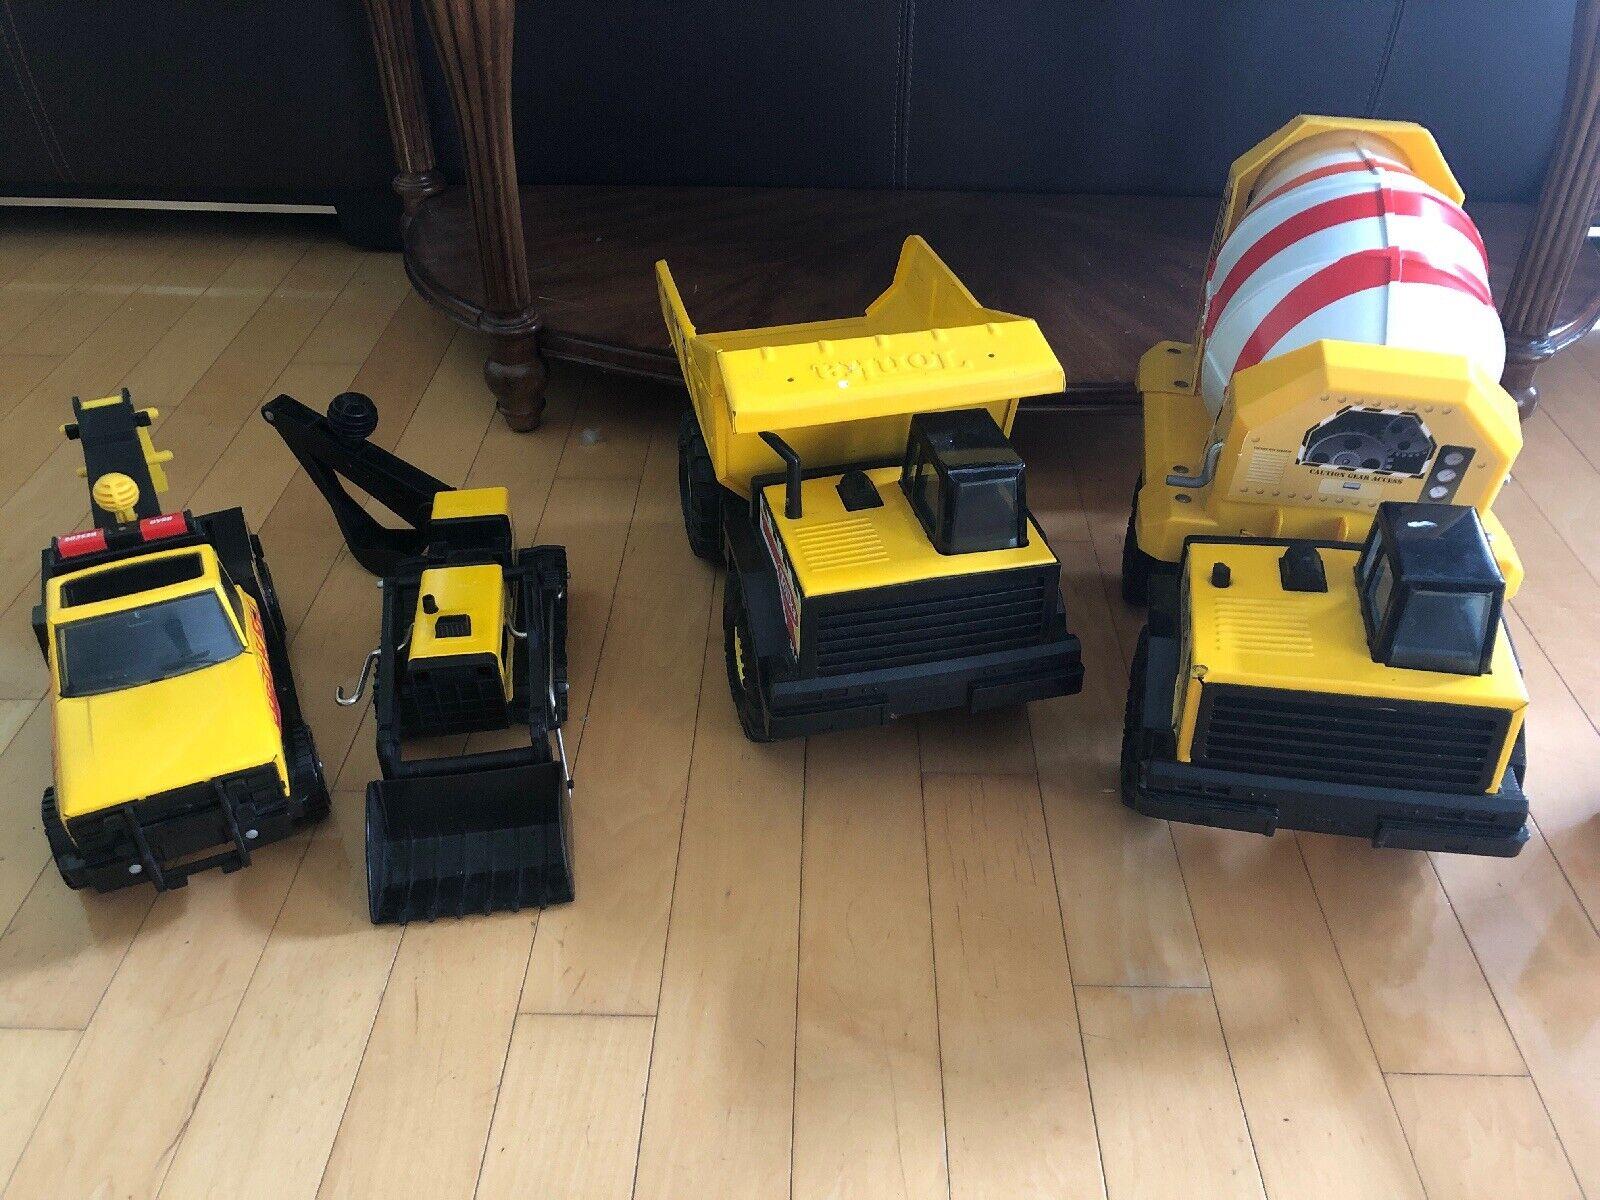 Lot Of 4 Hasbro Tonka Cement Mixer dump Truck  Other  Steel Plastic Yellow USA